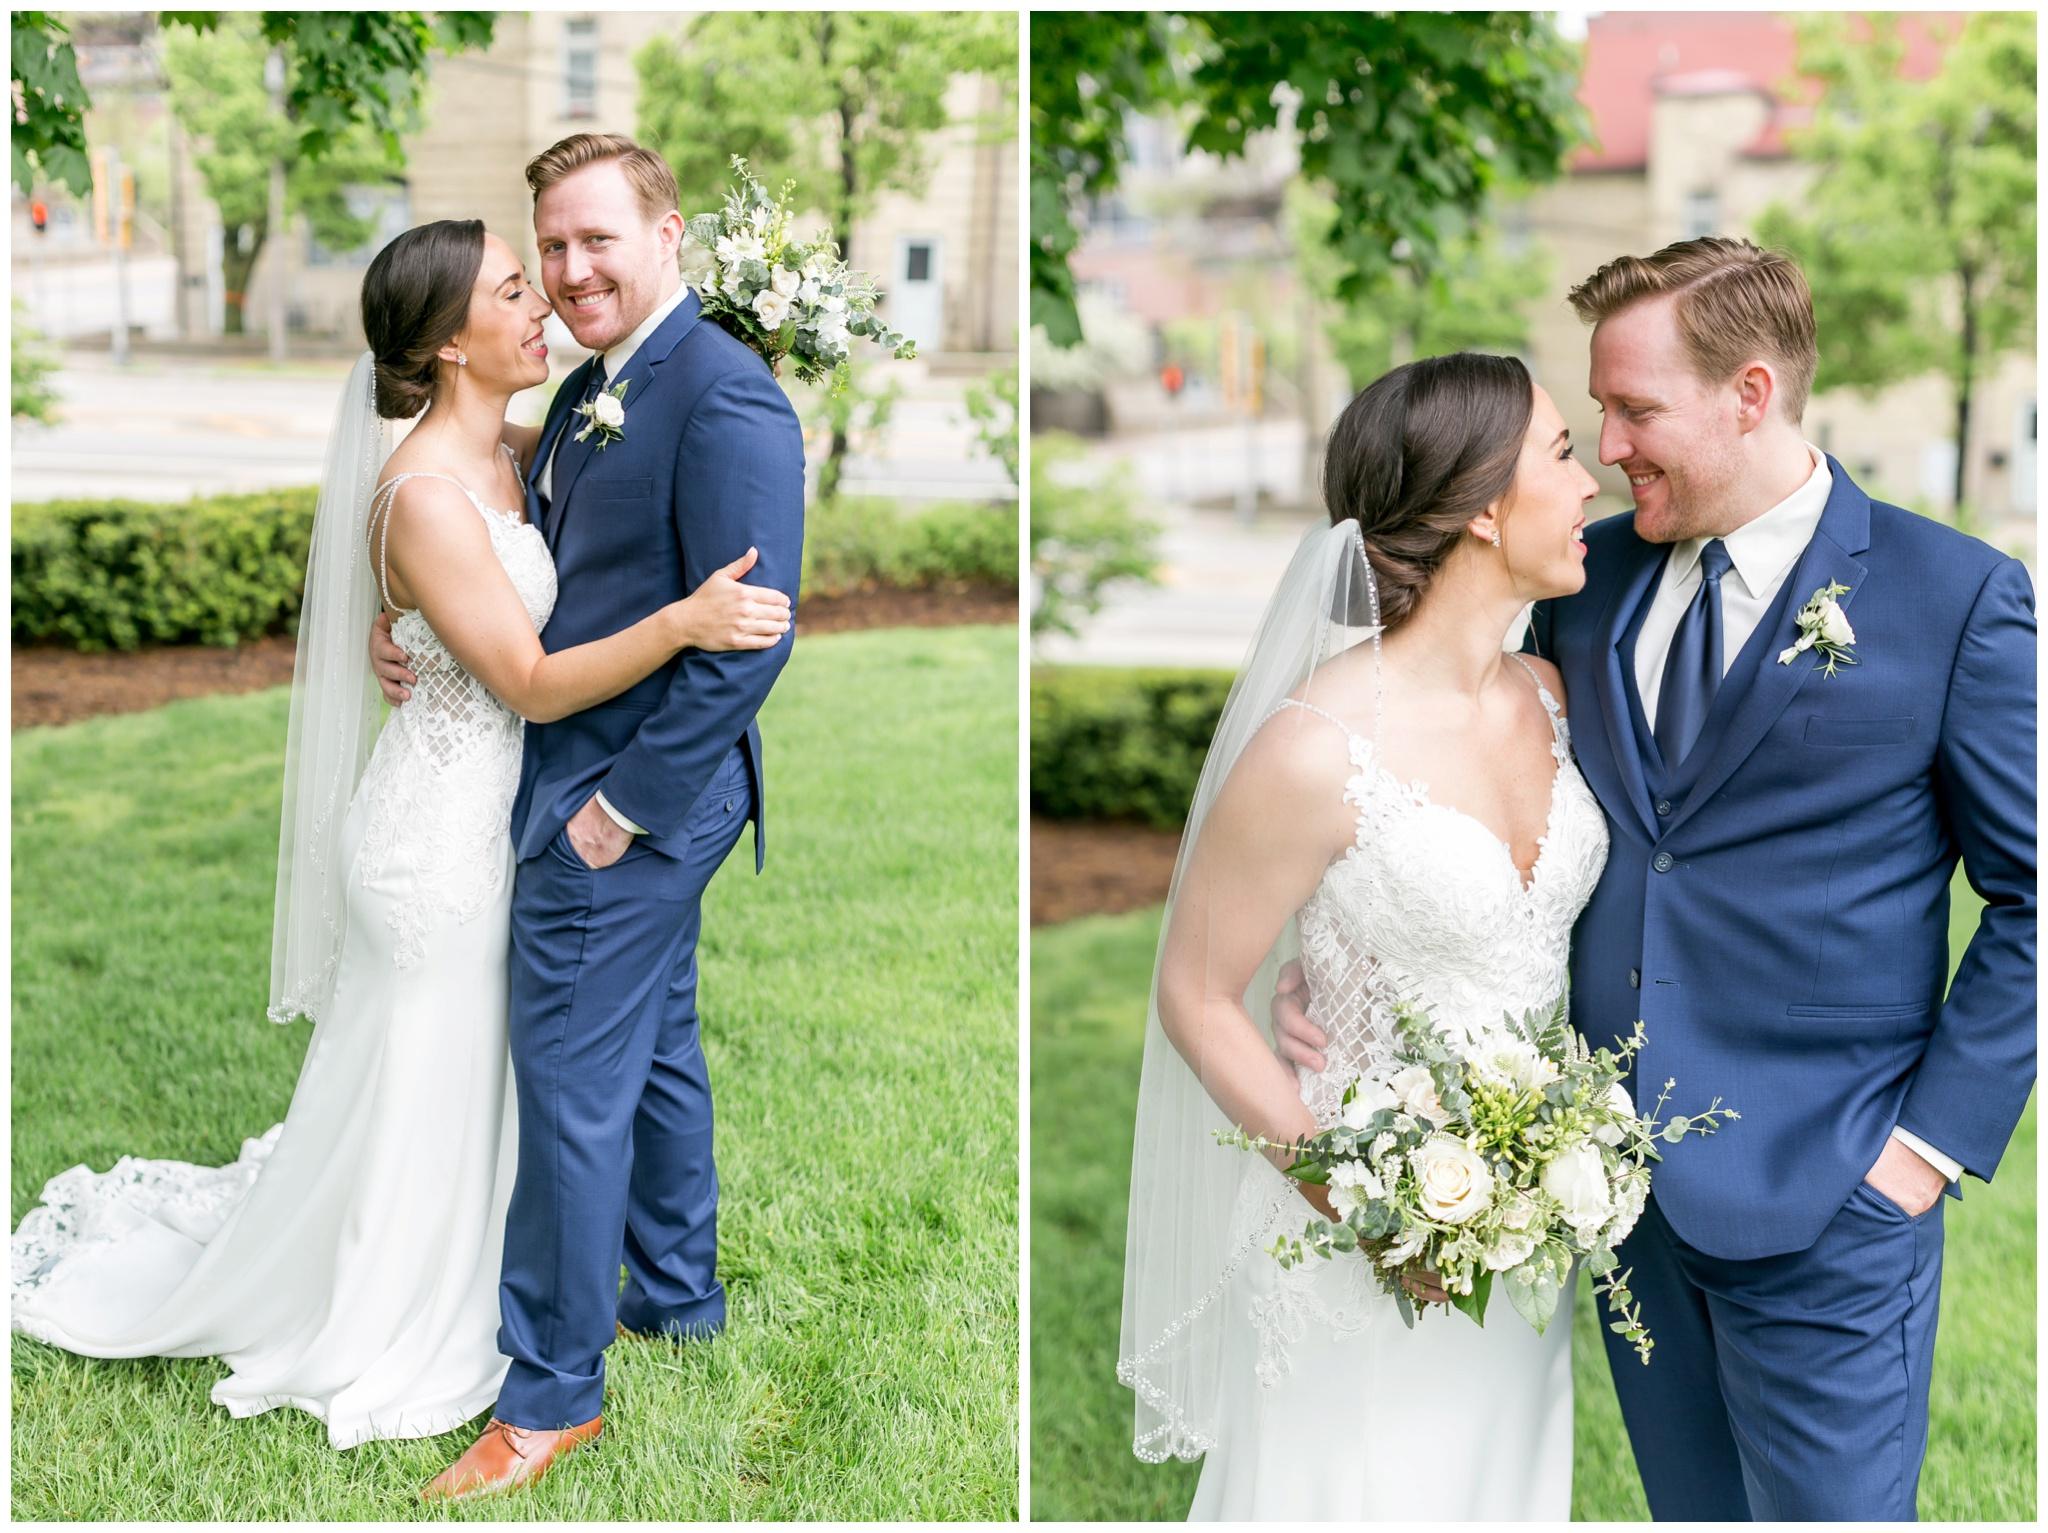 Union_south_Wedding_Madison_Wisconsin_Caynay_Photo_3640.jpg